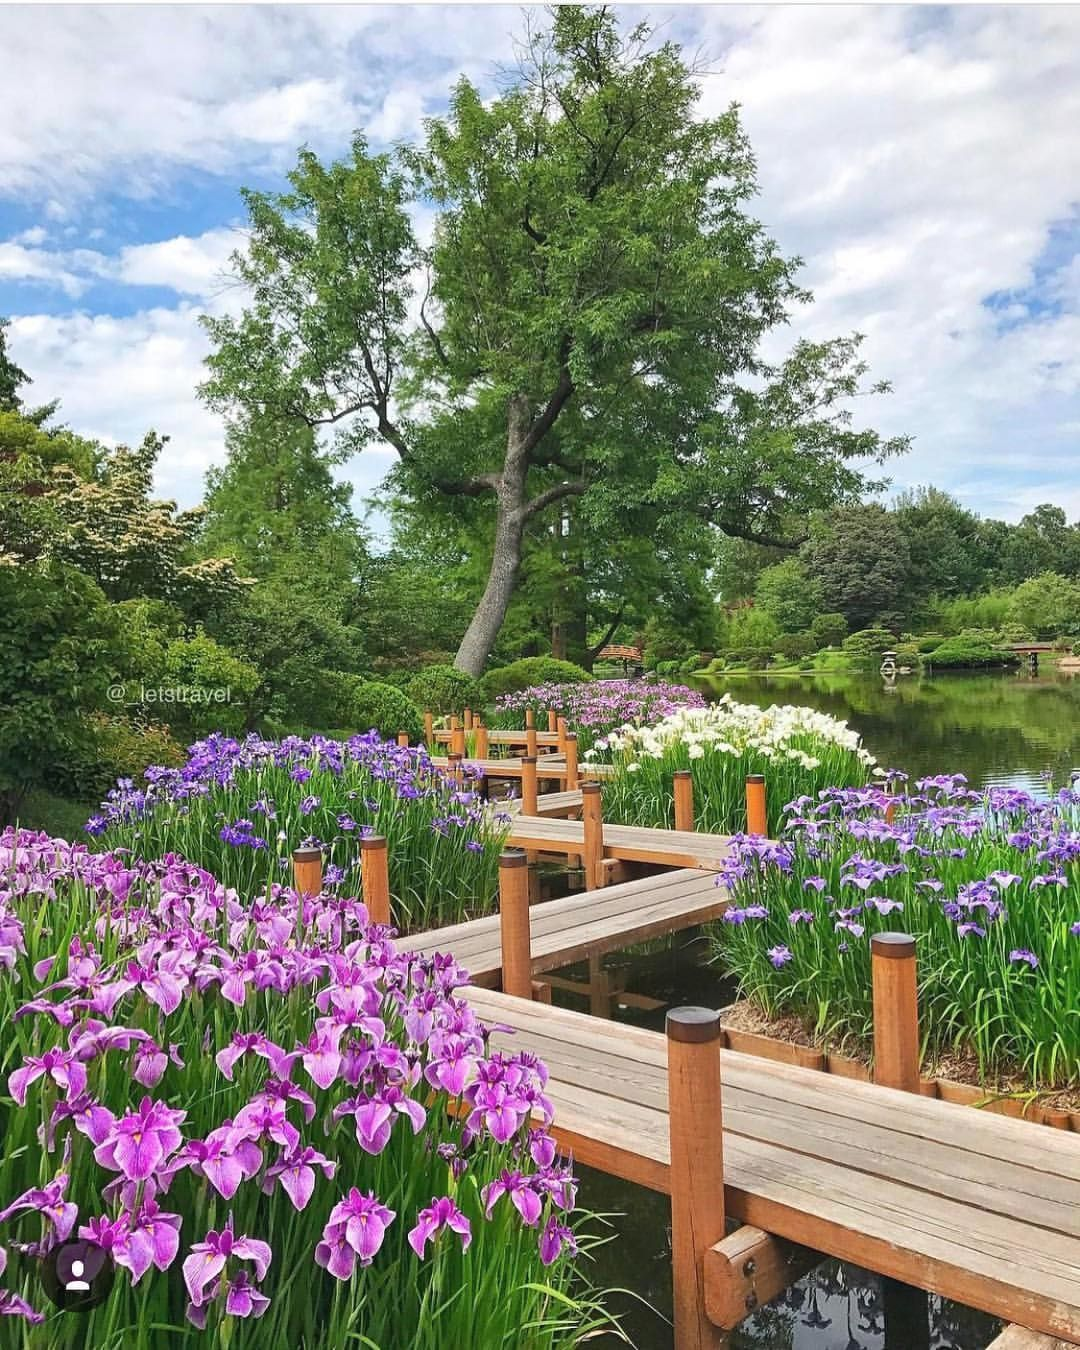 84495108ca263bc84ec9629da5c796c5 - Best Time To Visit Missouri Botanical Gardens